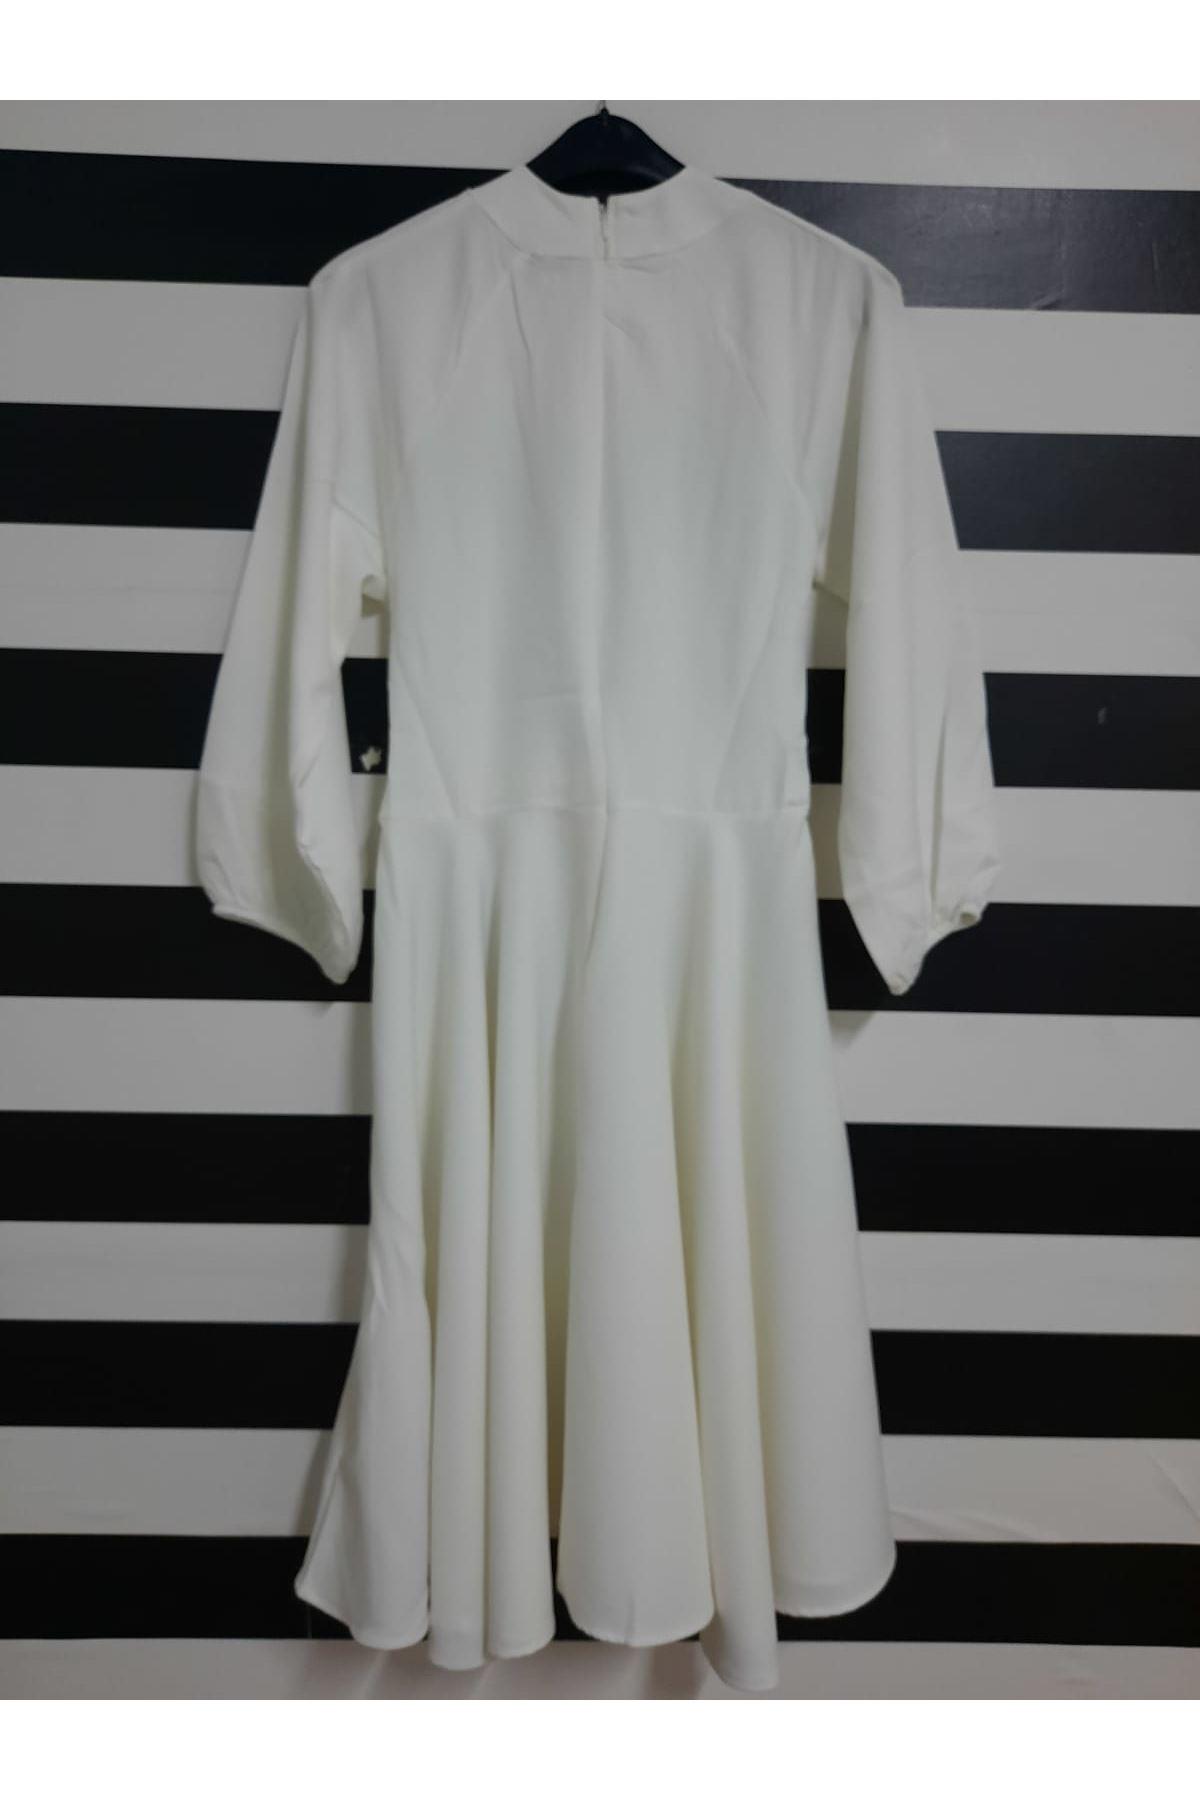 Çapraz Detaylı Midiboy Elbise - BEYAZ